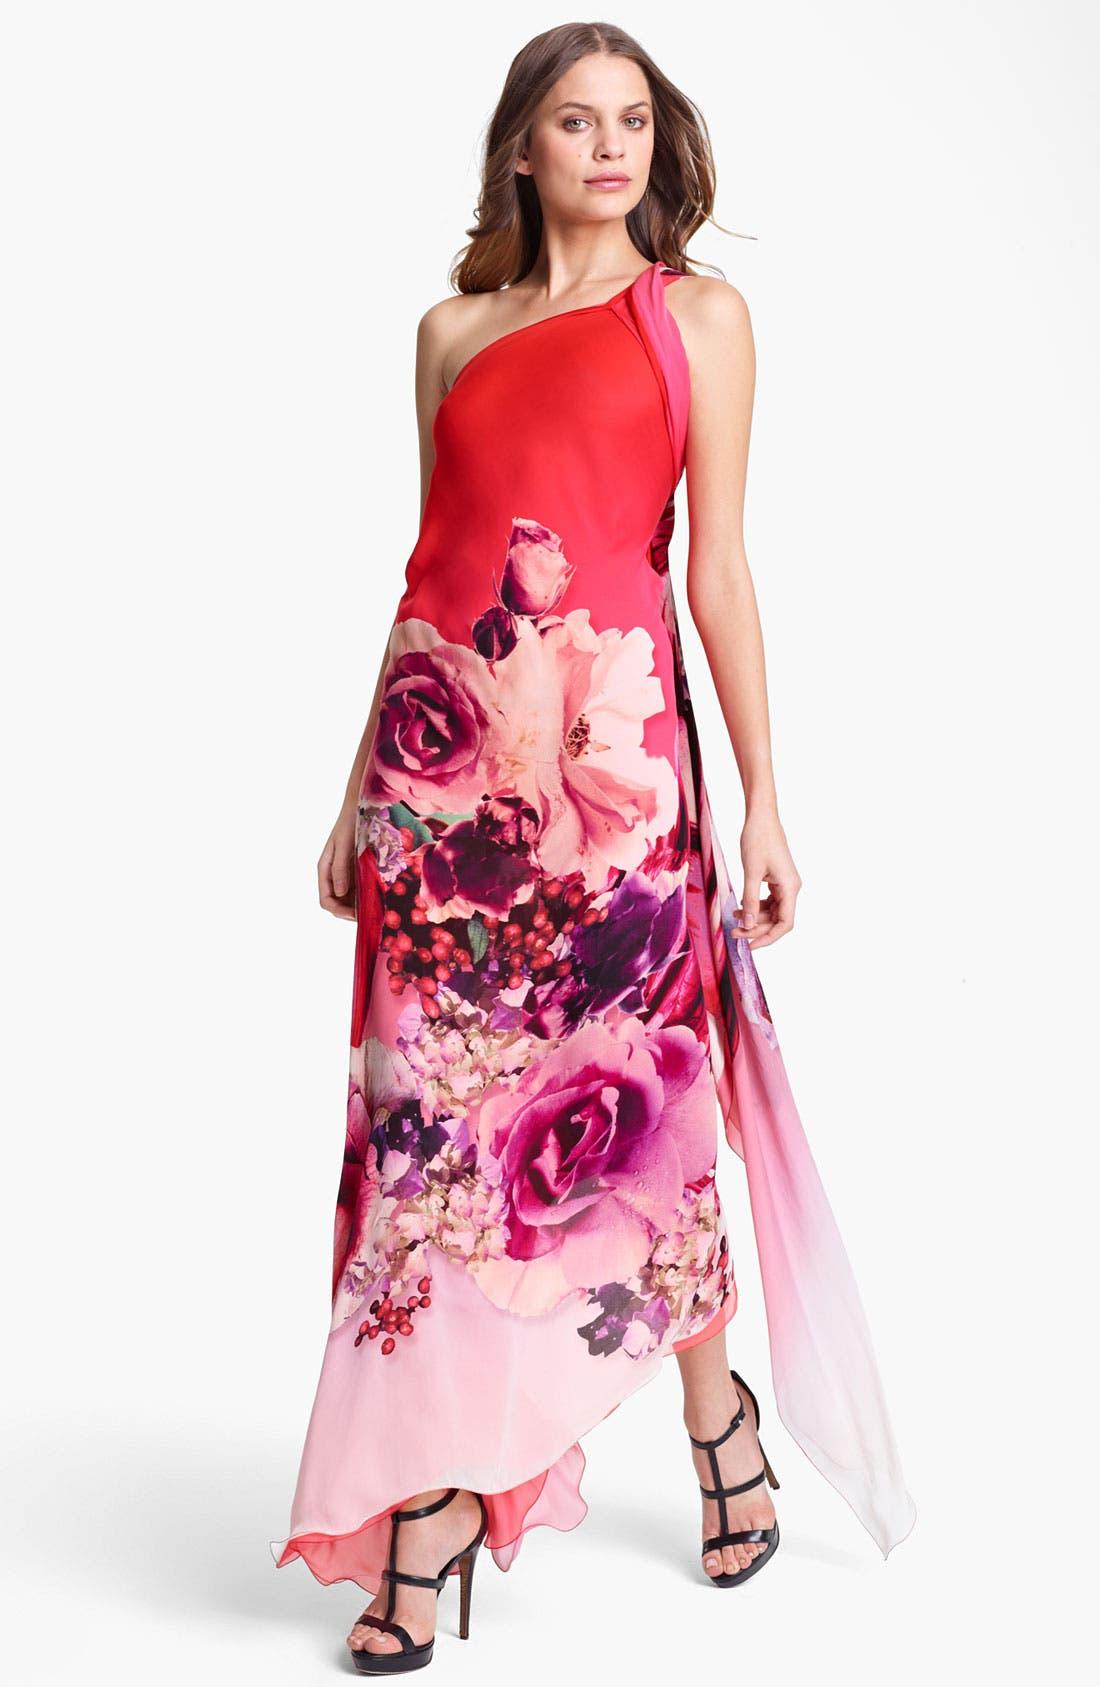 Alternate Image 1 Selected - Roberto Cavalli 'Veronique Print' One Shoulder Chiffon Gown